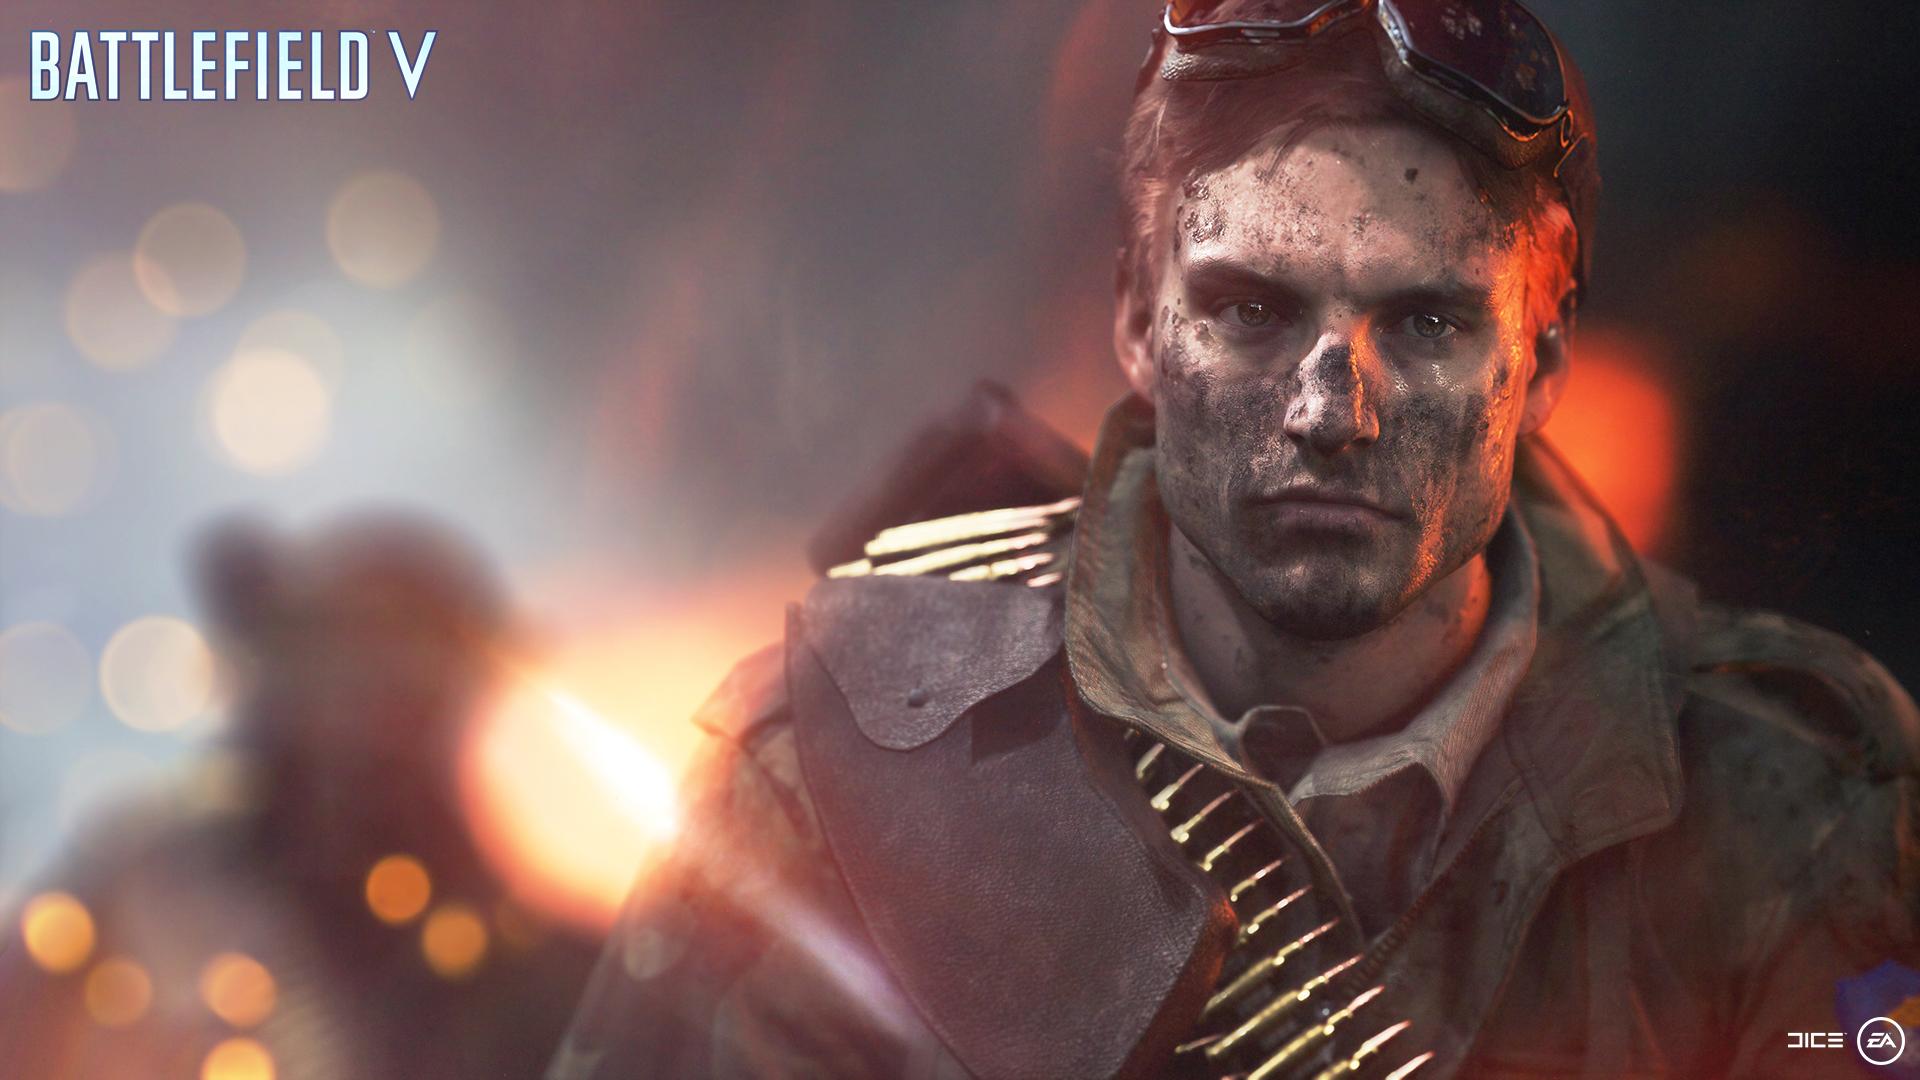 Battlefield 5' Update 1 05 Adds Bug Fixes for Overture